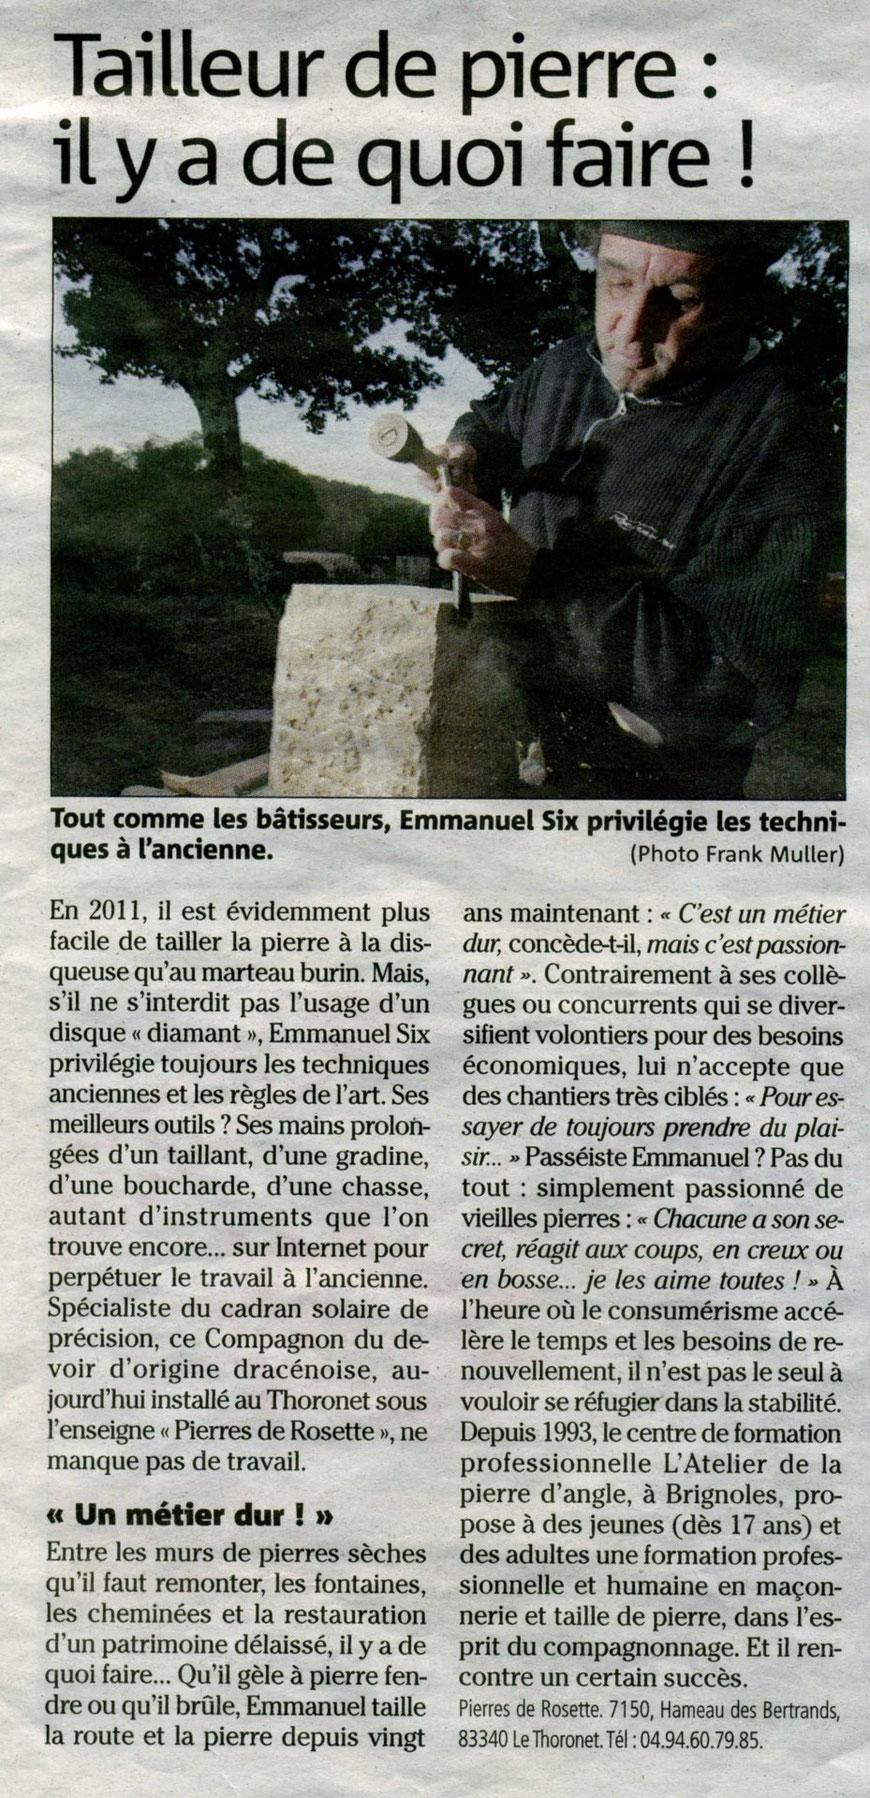 tailleur-pierre-emmanuel-six-thoronet-pierres-rosette-var-matin-cadran-solaire-fontaine-restauration